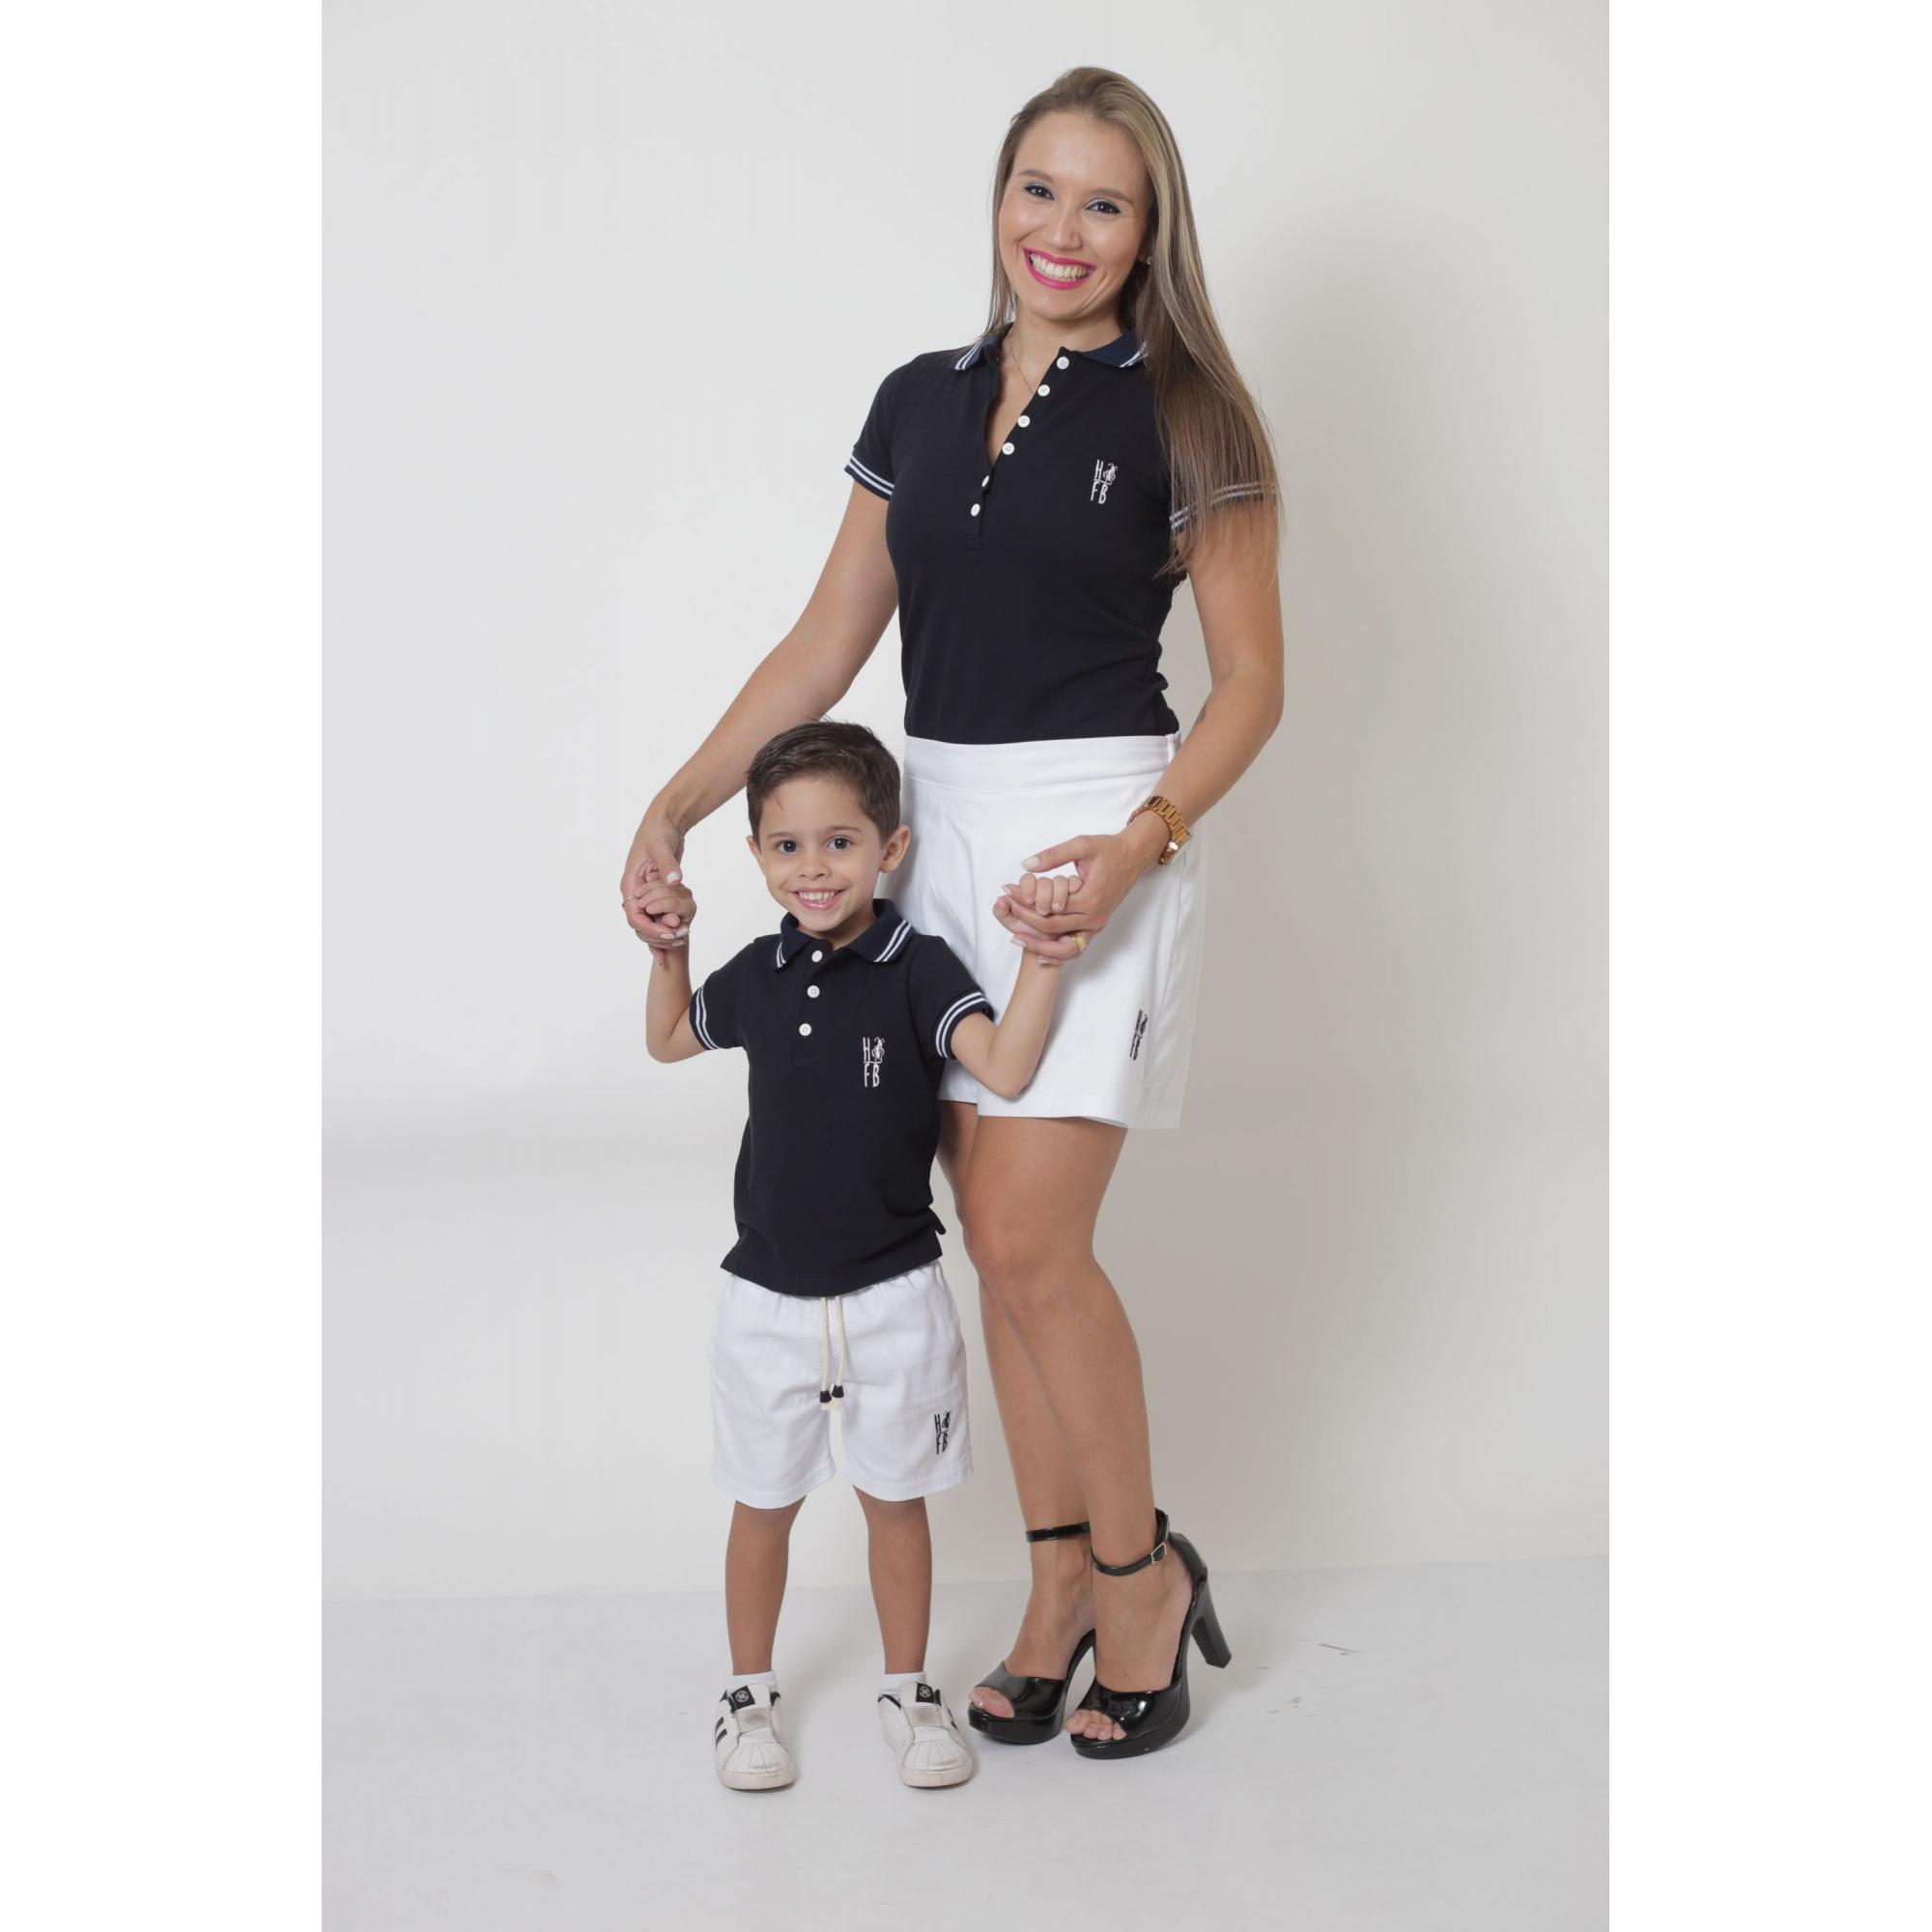 COMBO - MÃE E FILHO > Kit - Shorts Saia Branco e Polo Fem Azul + Bermuda Infantil Branca e Polo Infantil Azul [Coleção Tal Mãe Tal Filho]  - Heitor Fashion Brazil